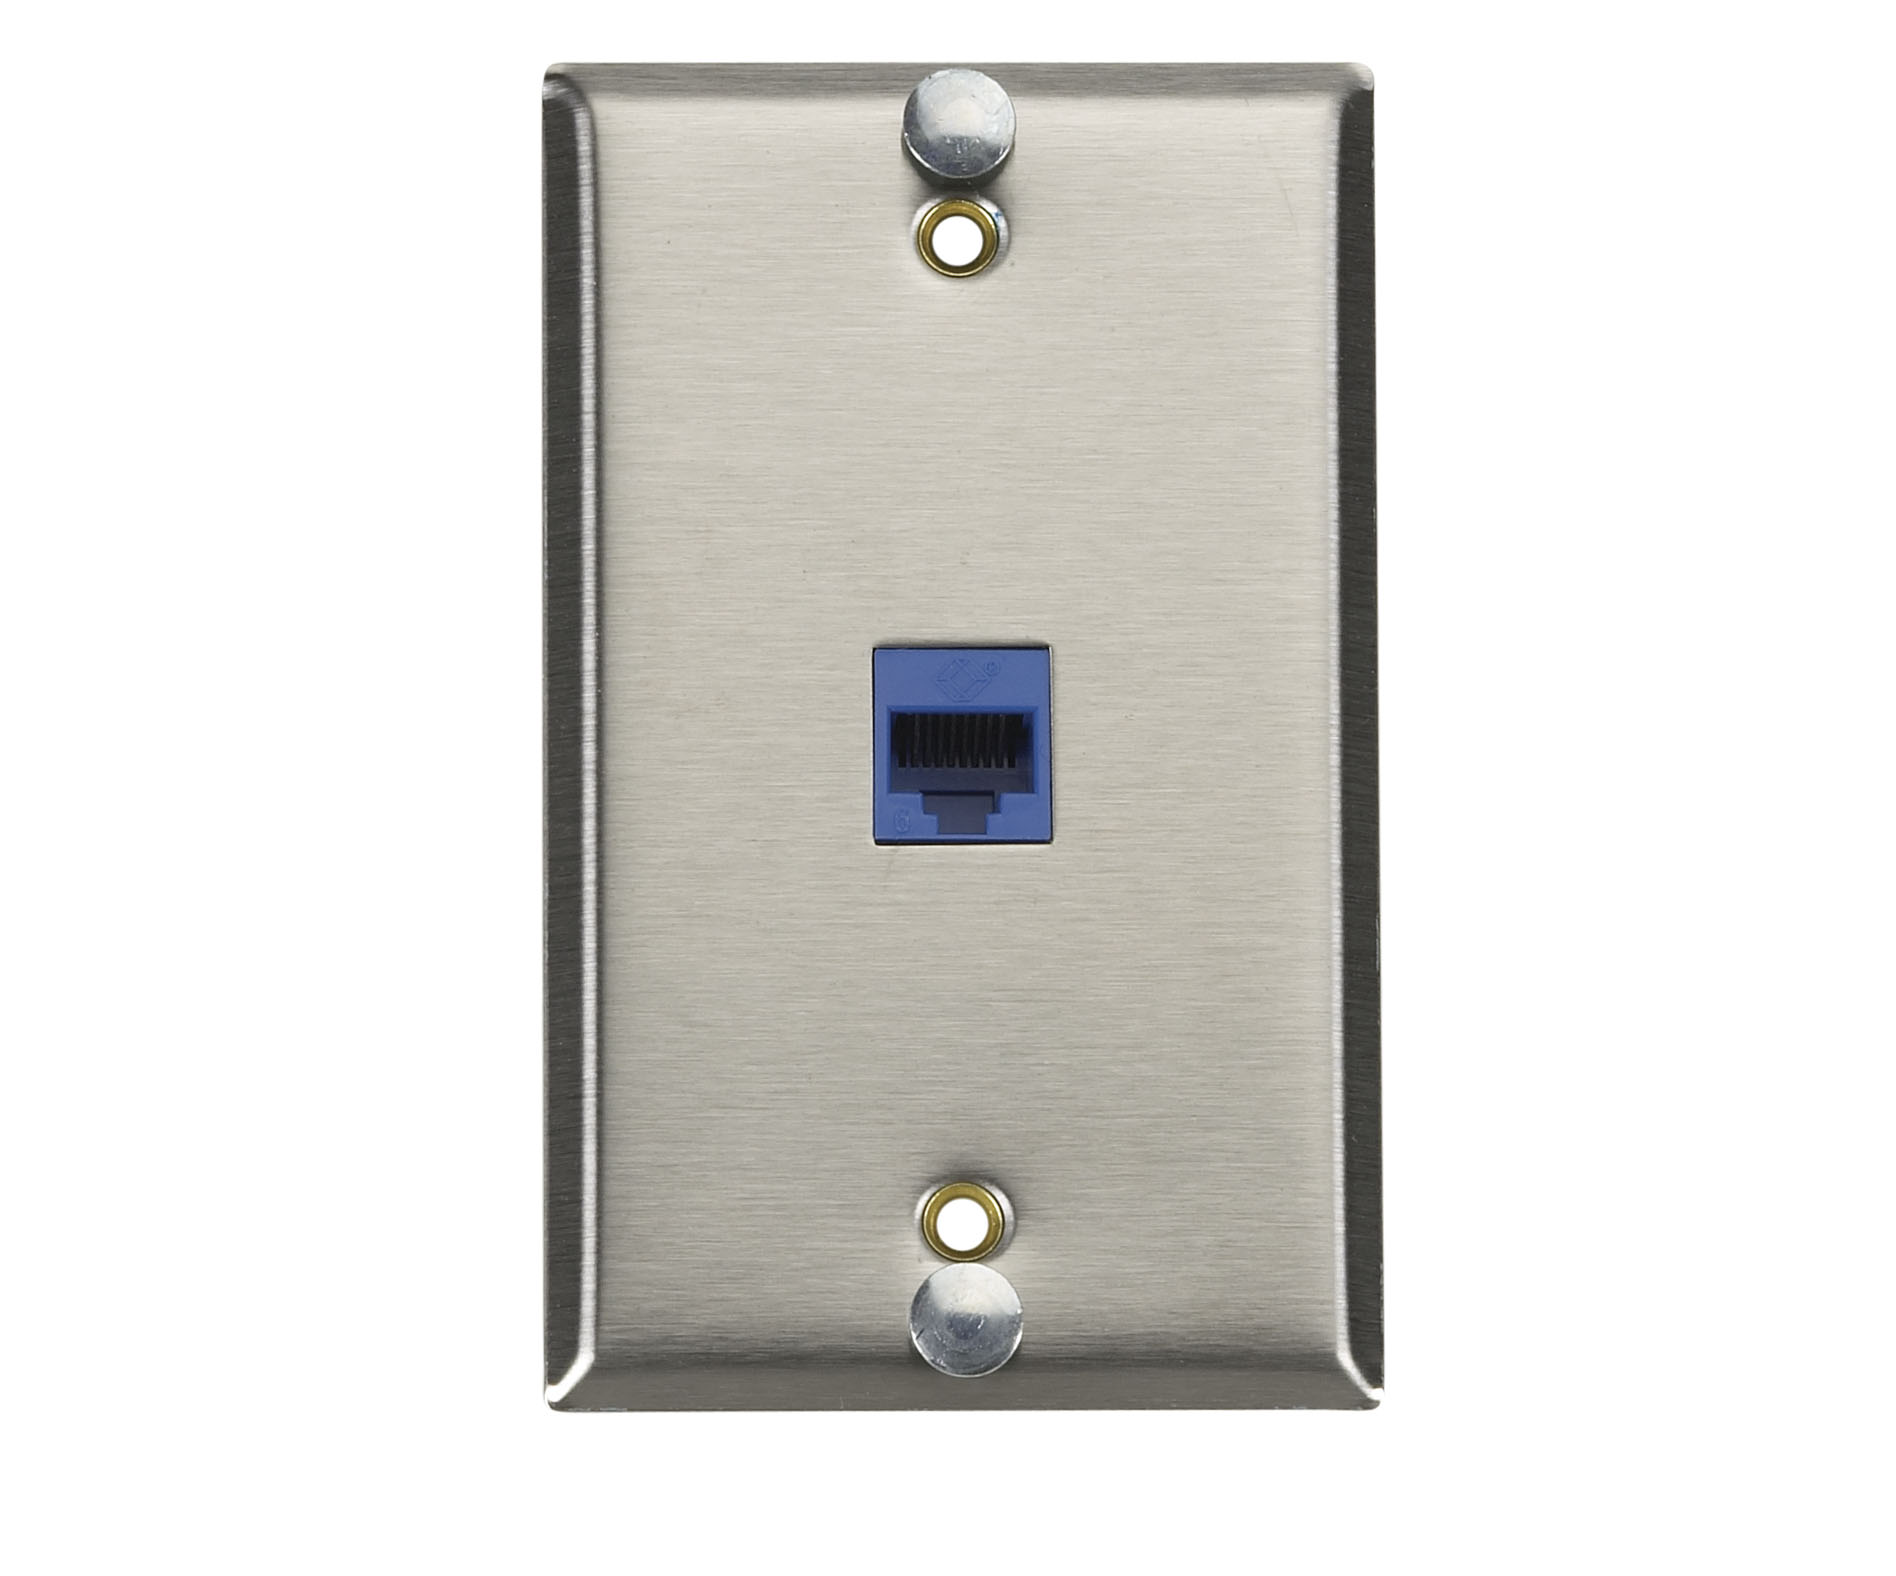 CAT6 VoIP Stainless Steel Wallplate | Black Box